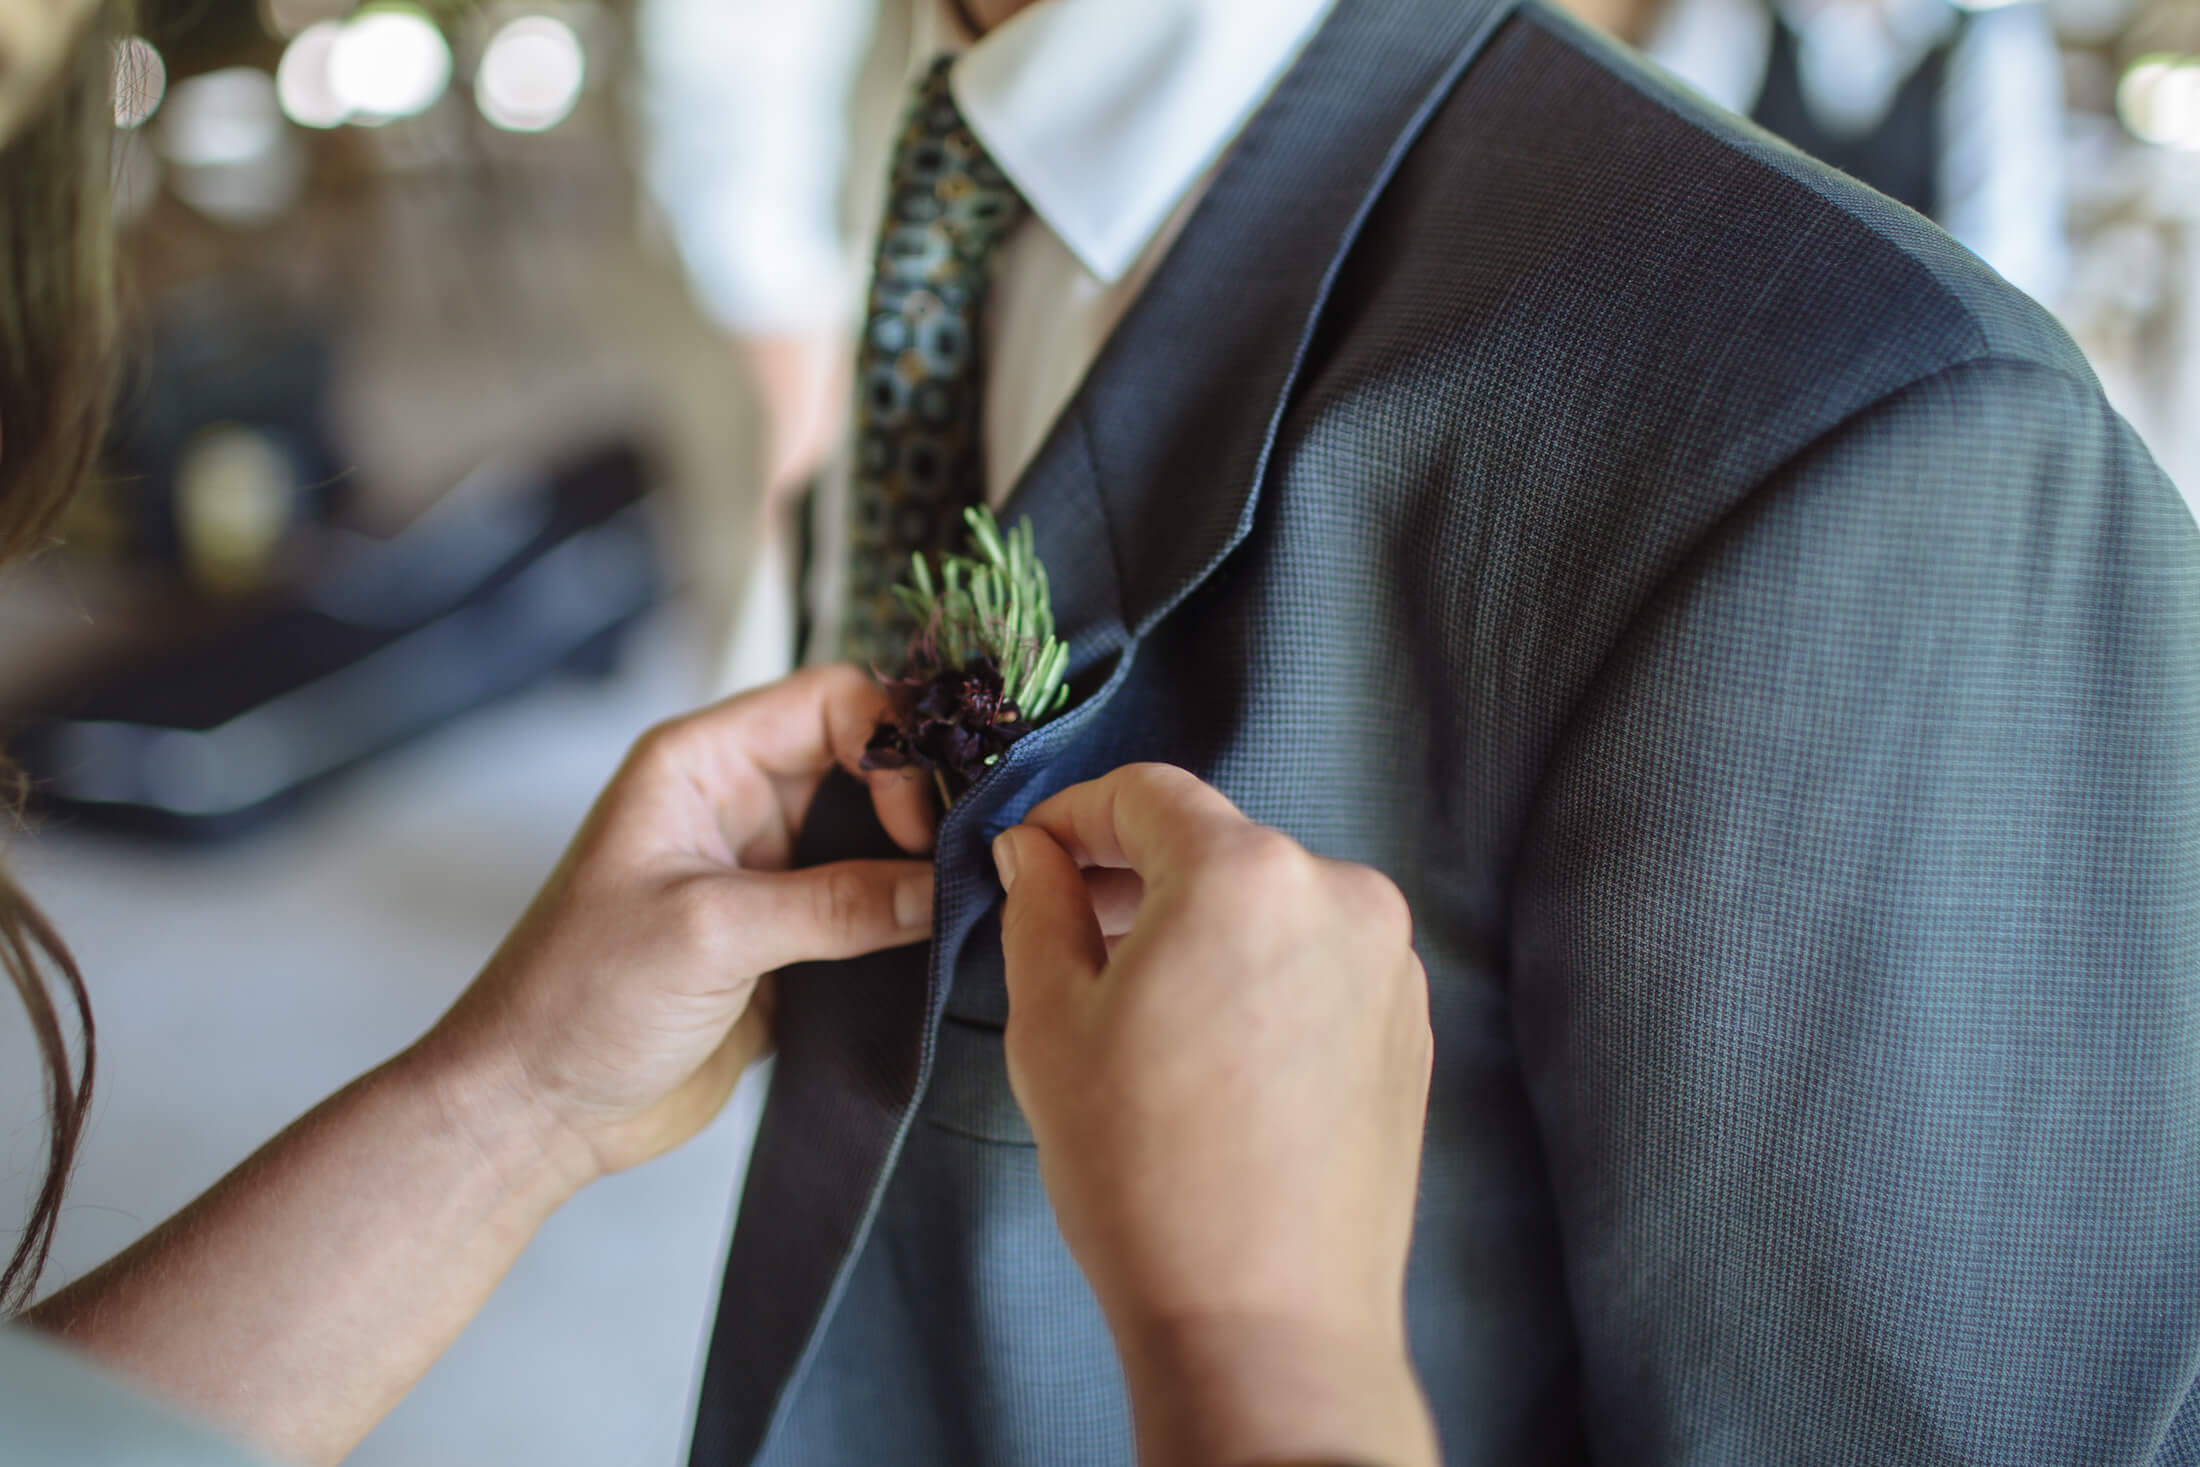 engle-olson-ray-kelly-photography-wisconsin-wedding-52.jpg